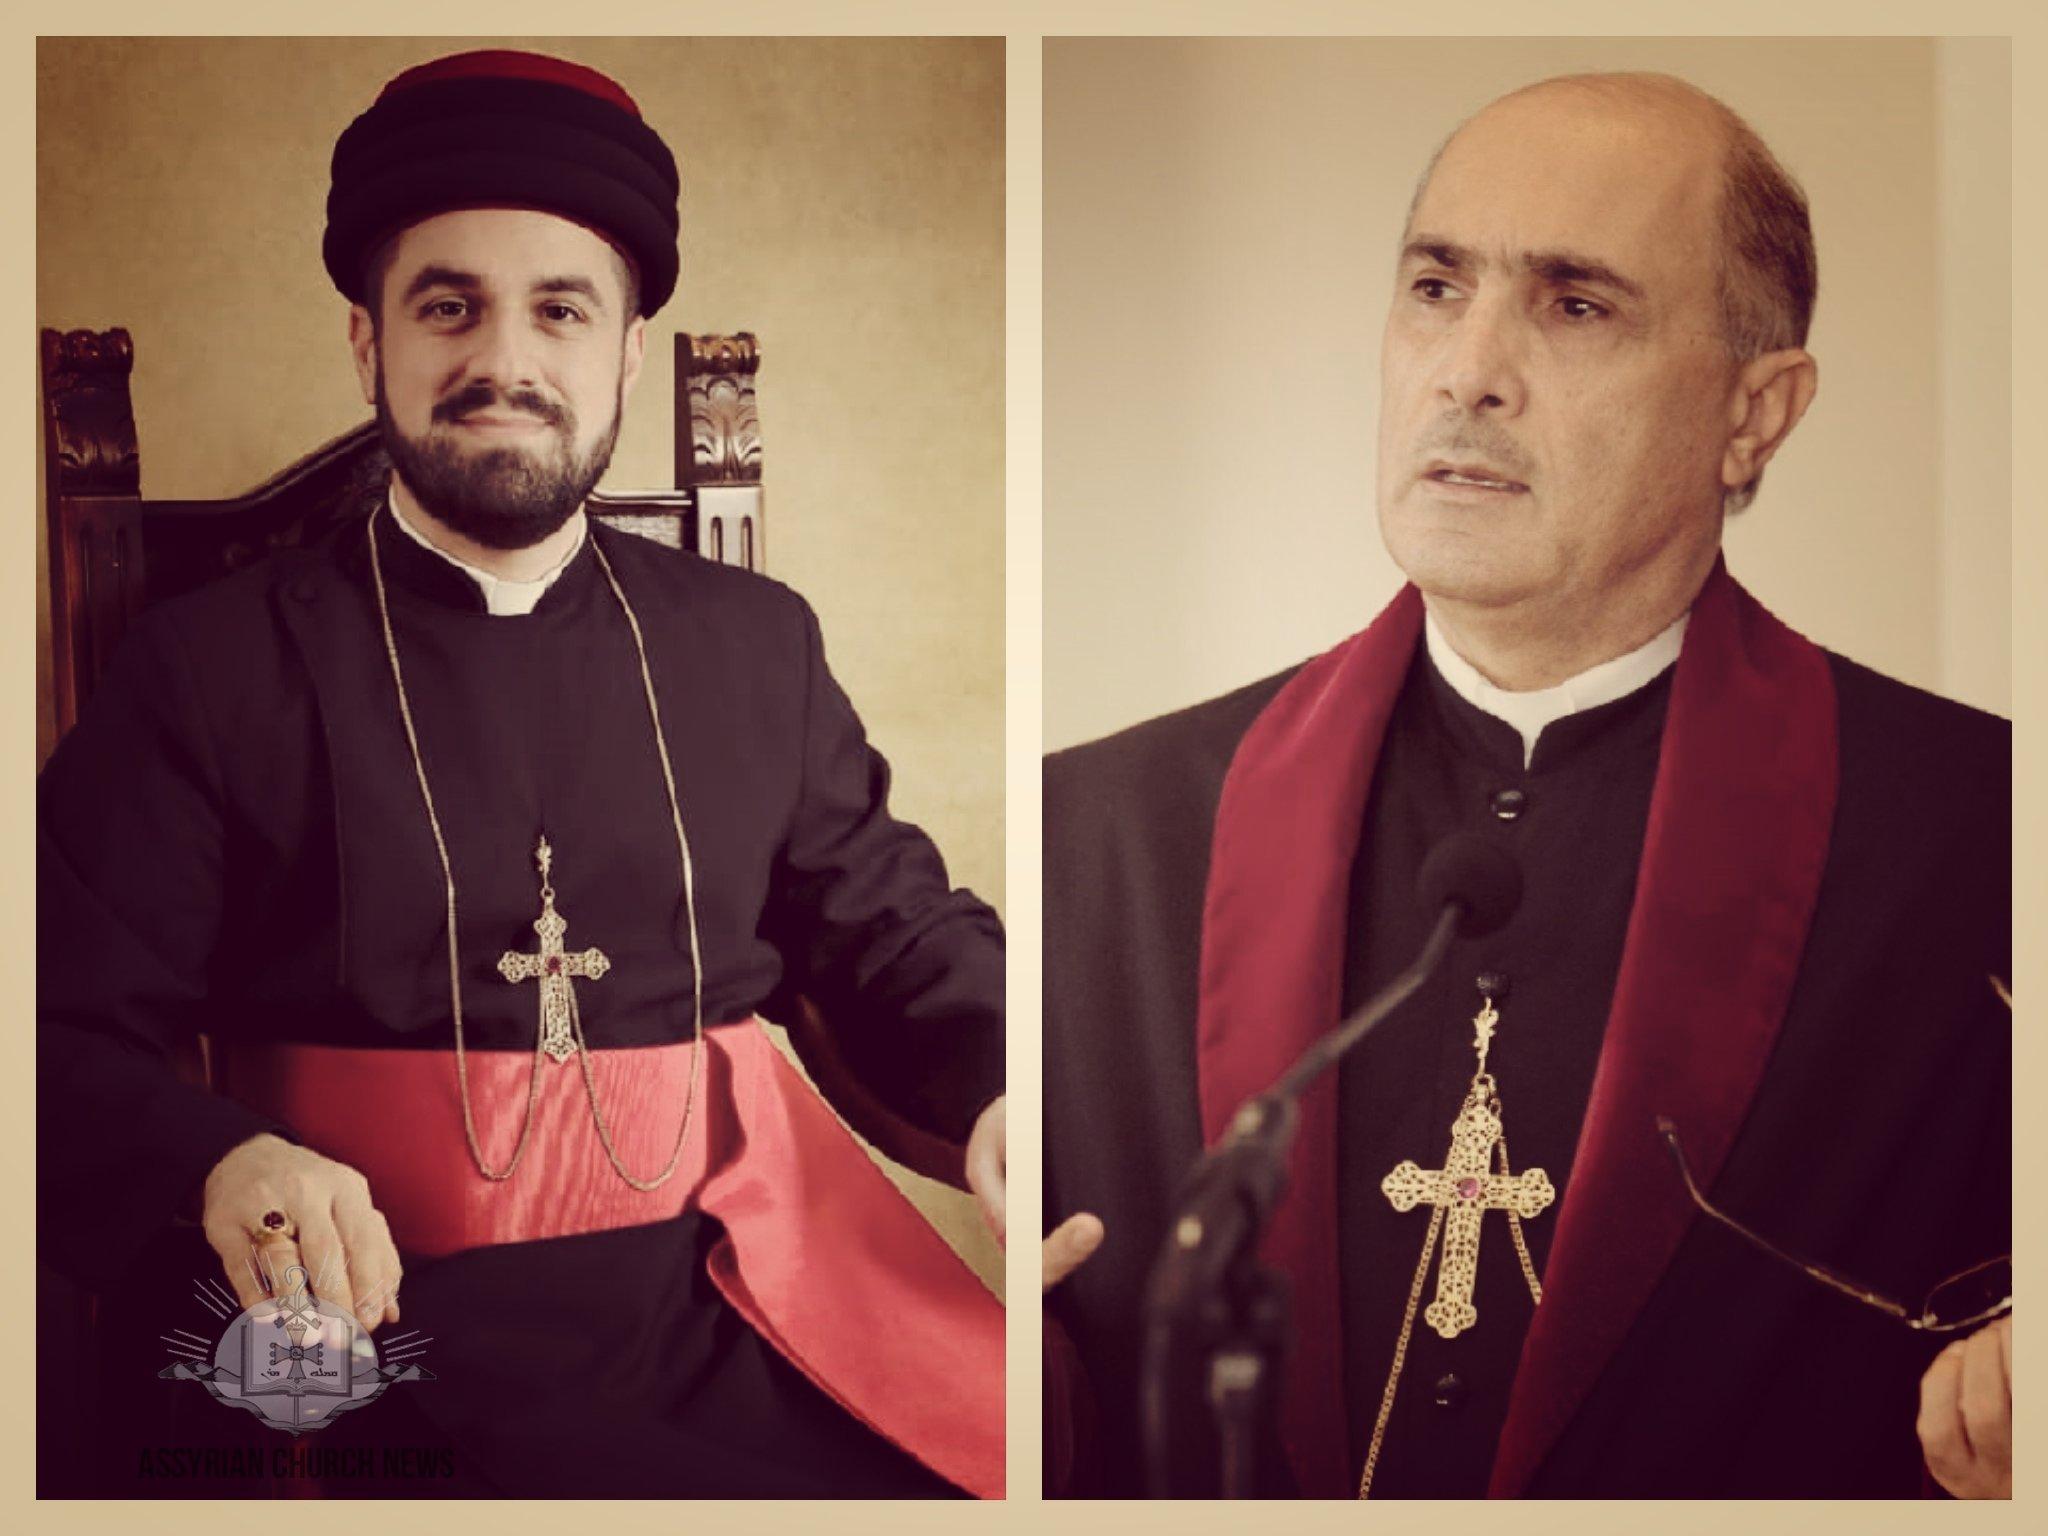 555c28250 رسالة تهنئة من غبطة المطران مار ميلس زيا إلى نيافة الأسقف مار أوراهام يوخانس